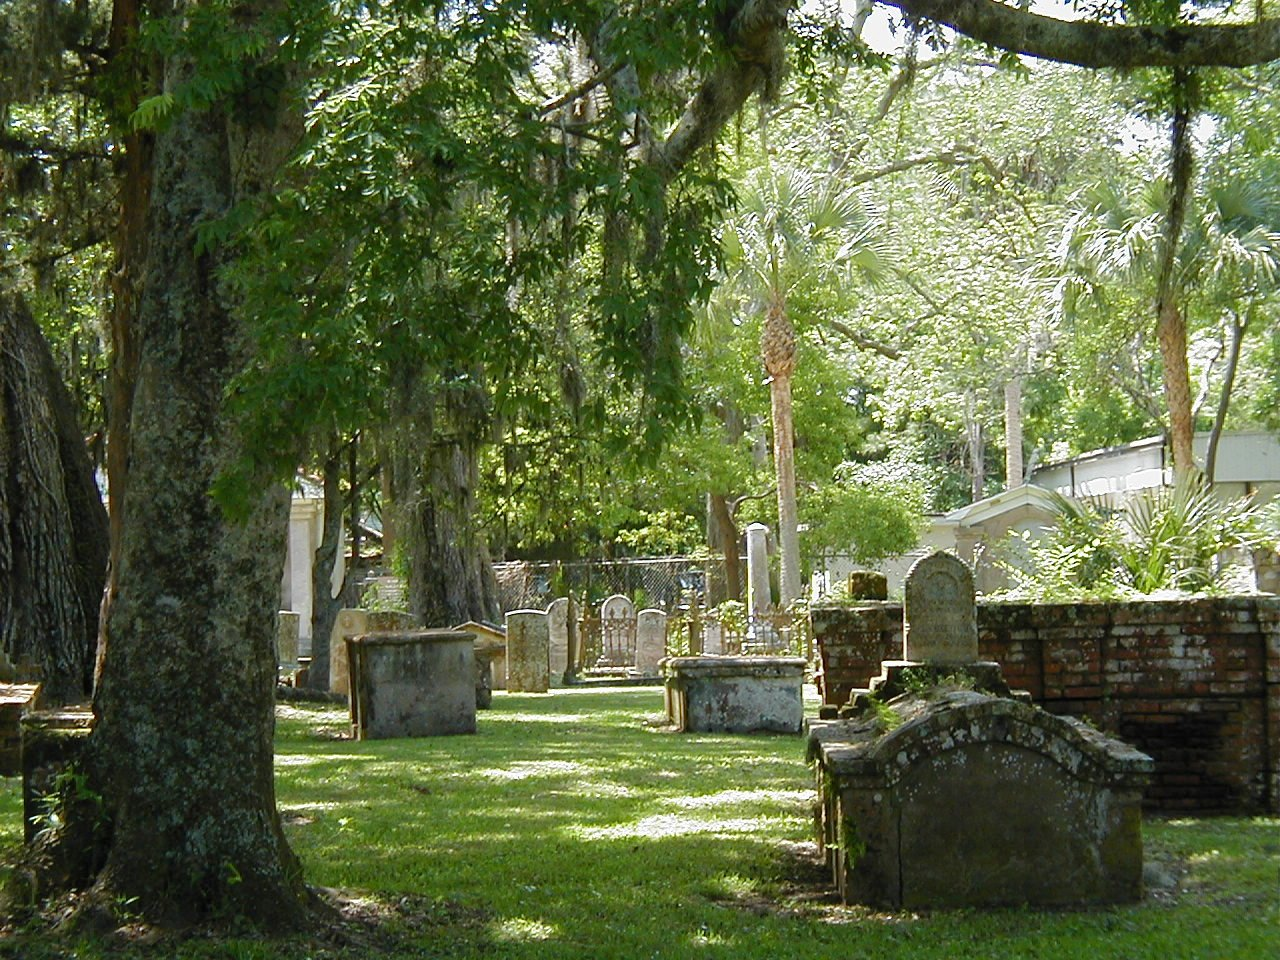 Tomolato Cemetery St Augustine madeinaday.com